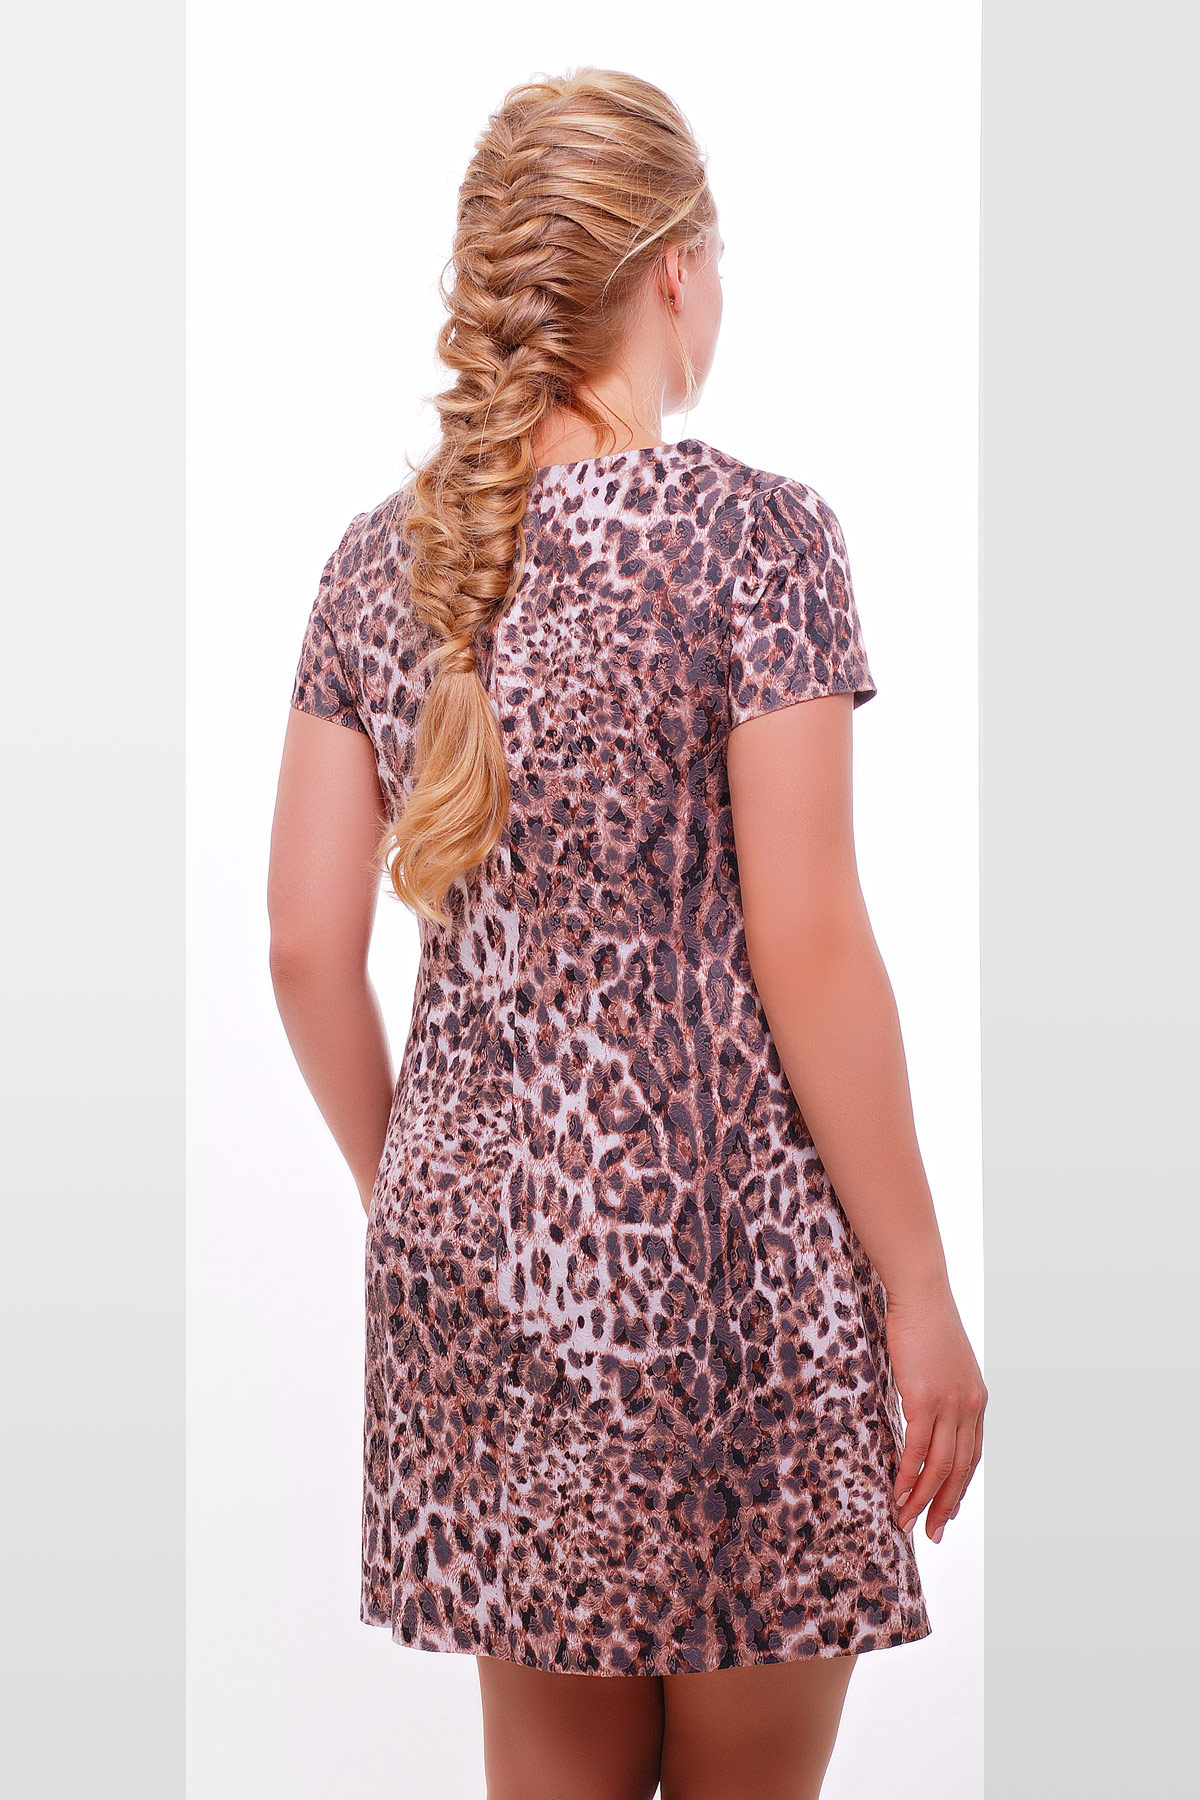 7c958926d12 нарядное женское платье батал из жаккарда. платье Миранда-Б к р. Цвет